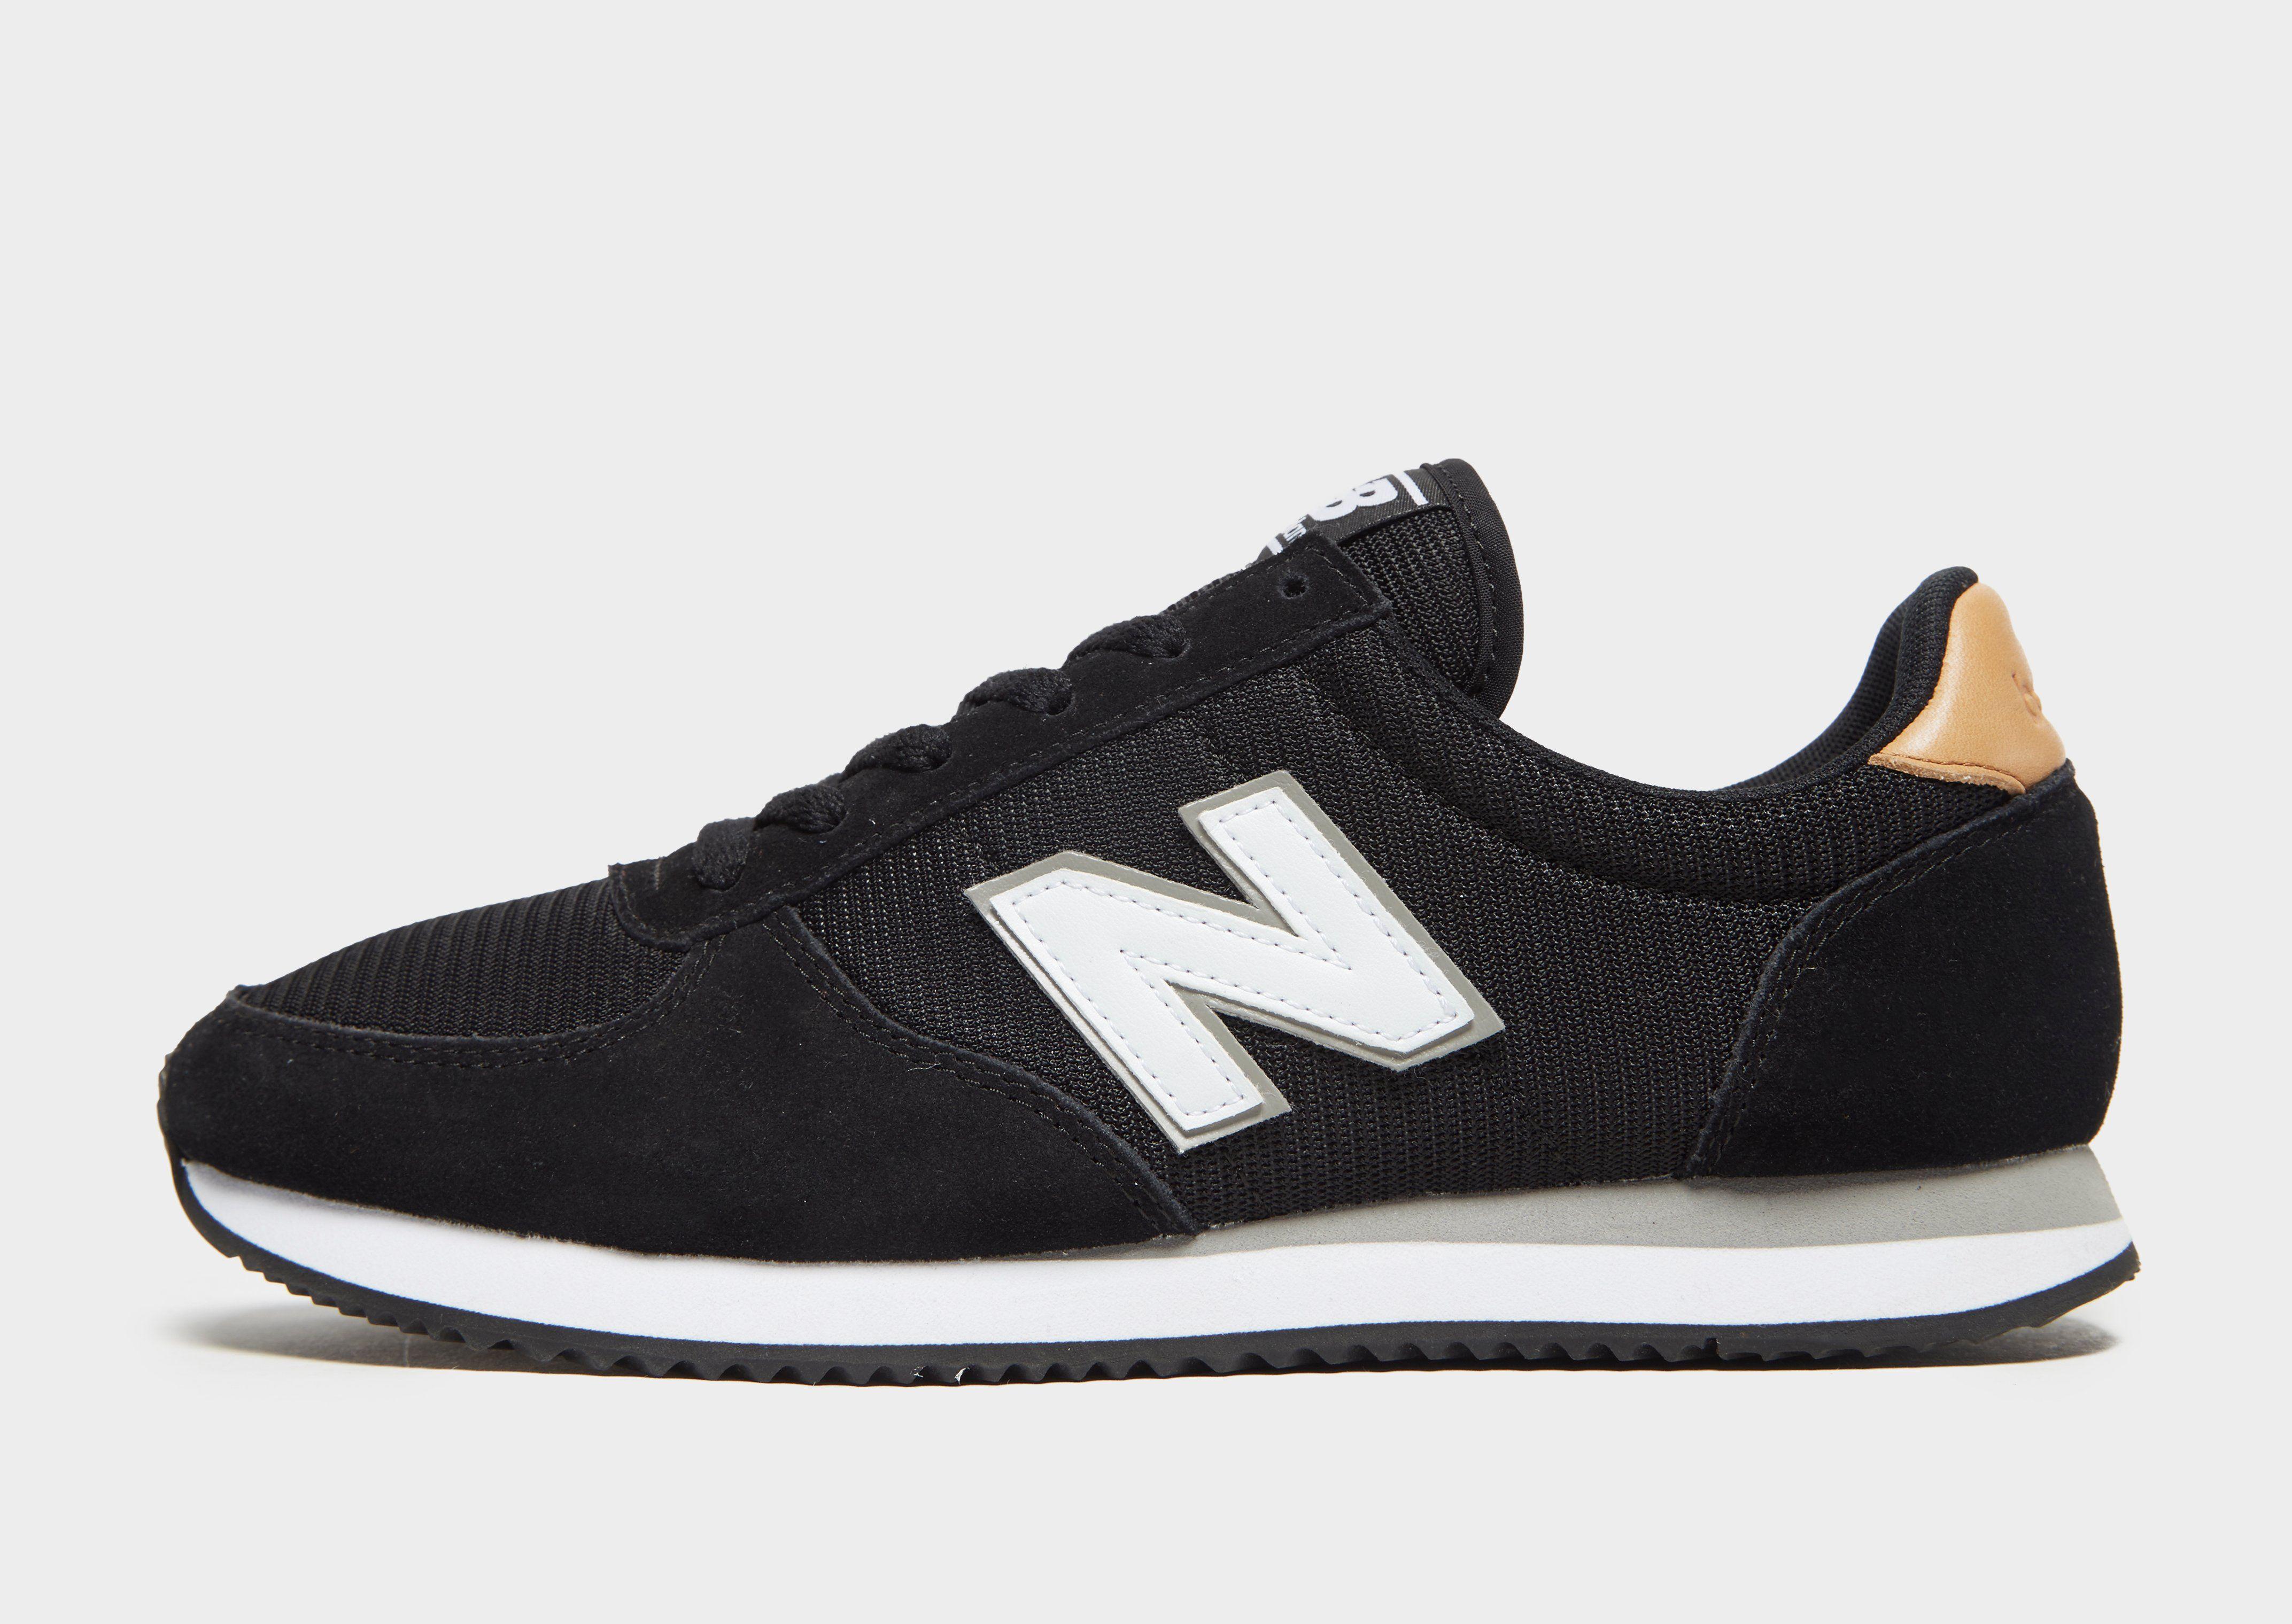 New Balance Shoes 220 (black)